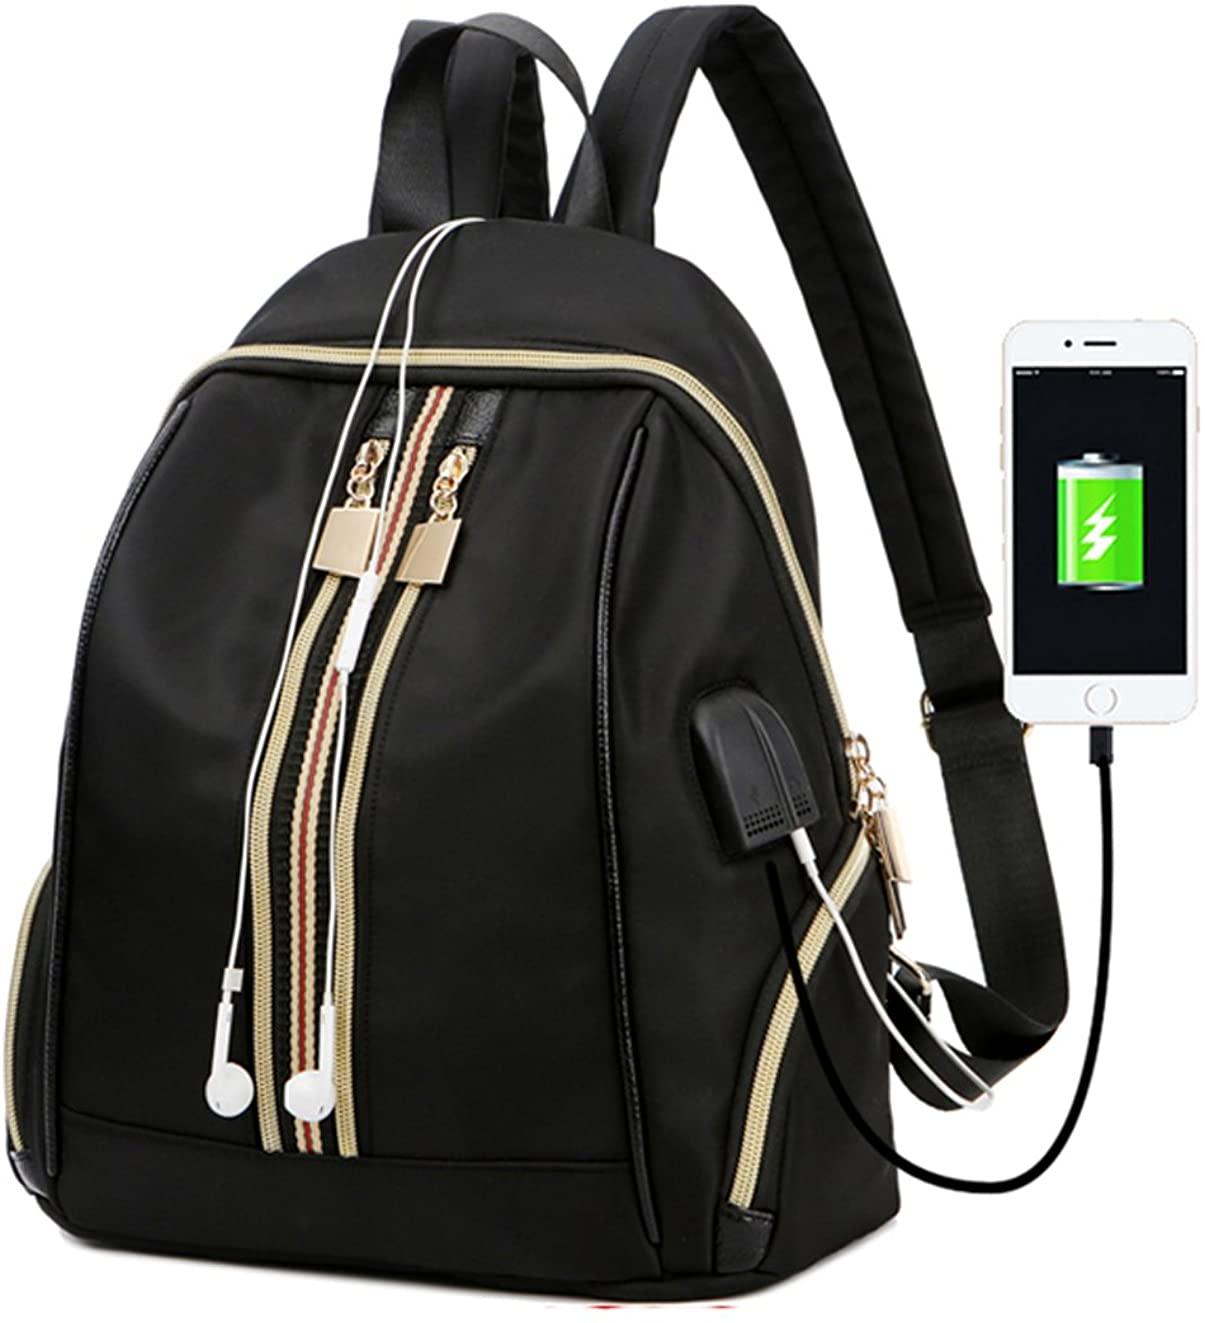 Fshion Women Mini Backpack Usb Charging School Bags For Women Girls Students Satchel